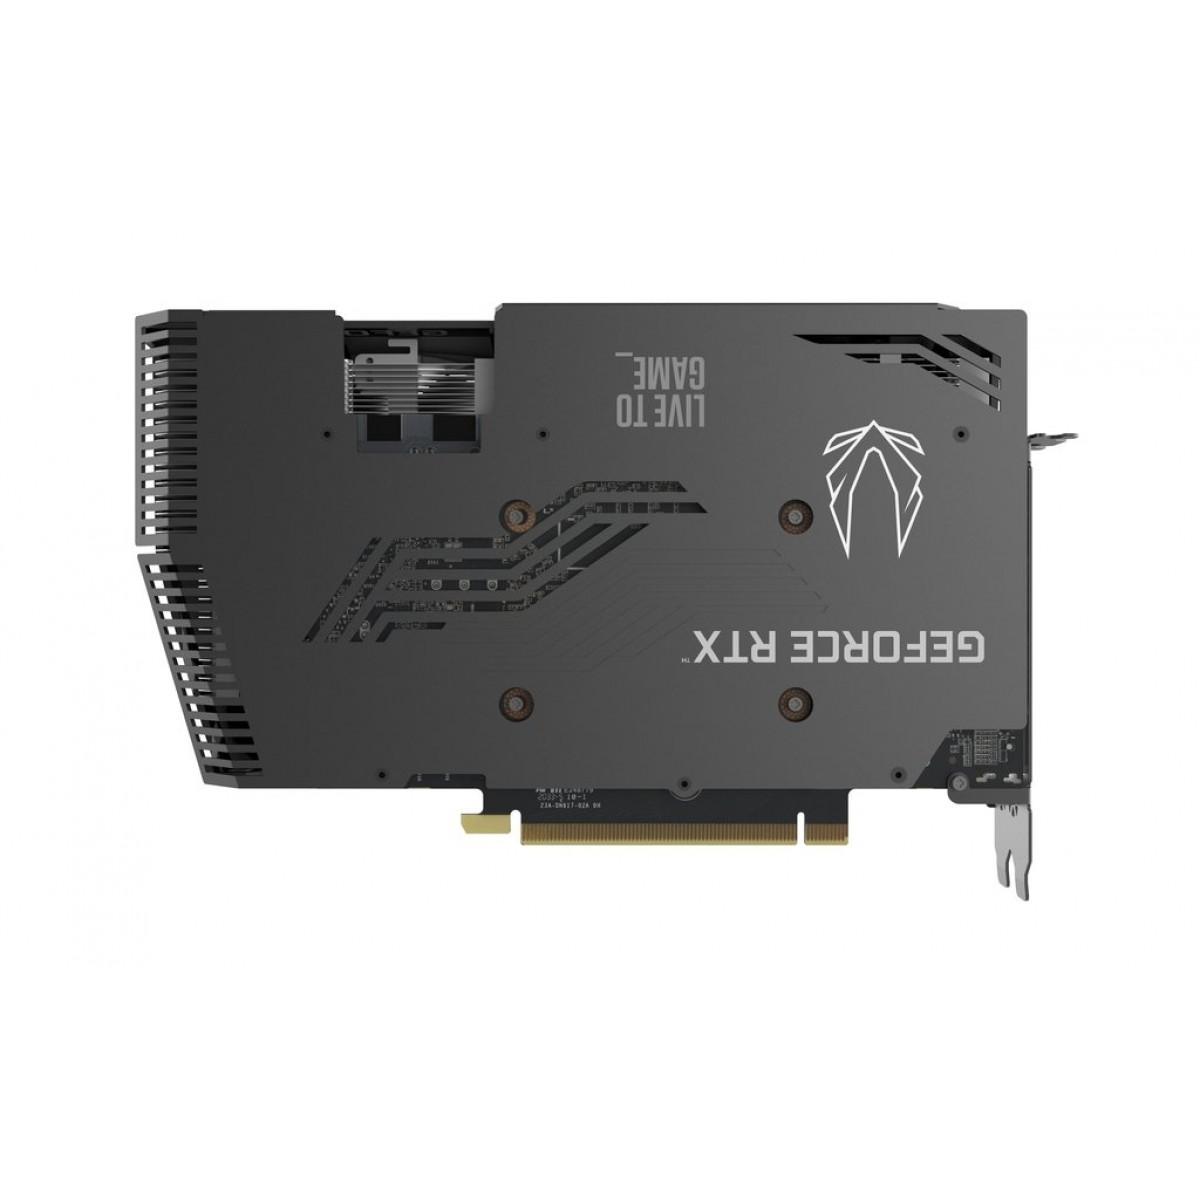 Placa de Vídeo Zotac Gaming GeForce RTX 3070 Twin Edge LHR 8GB GDDR6 - ZT-A30700E-10PLHR